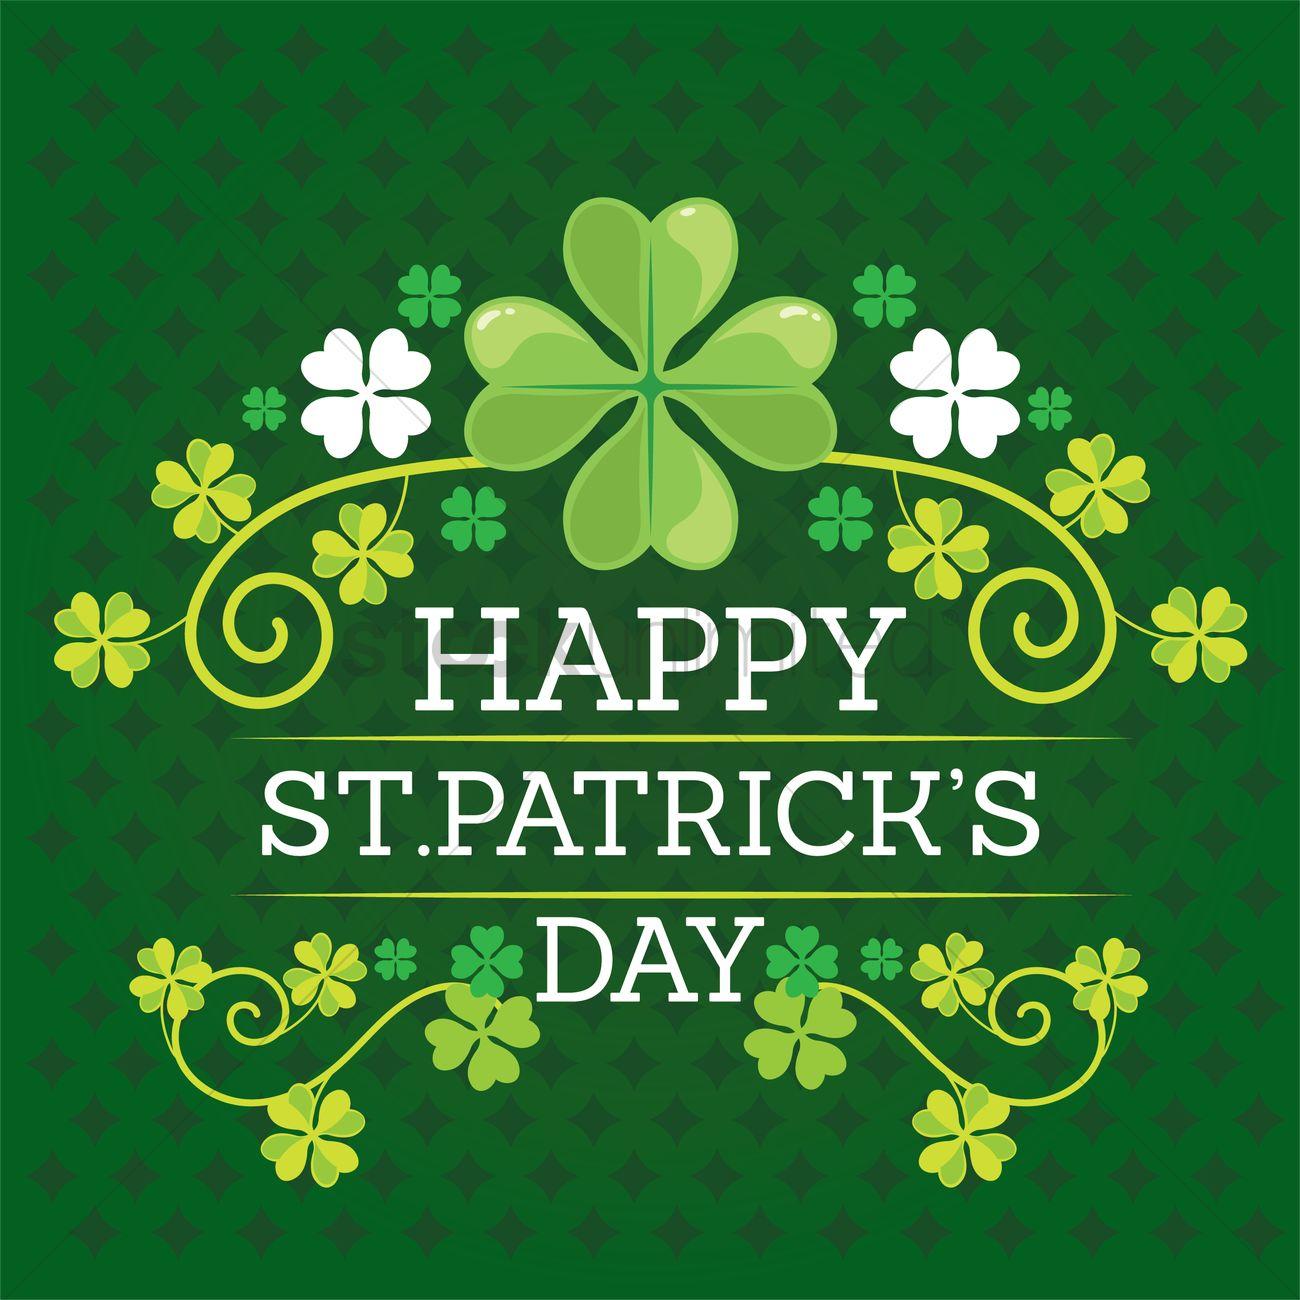 Happy st patricks day vector image 1991593 stockunlimited happy st patricks day vector graphic biocorpaavc